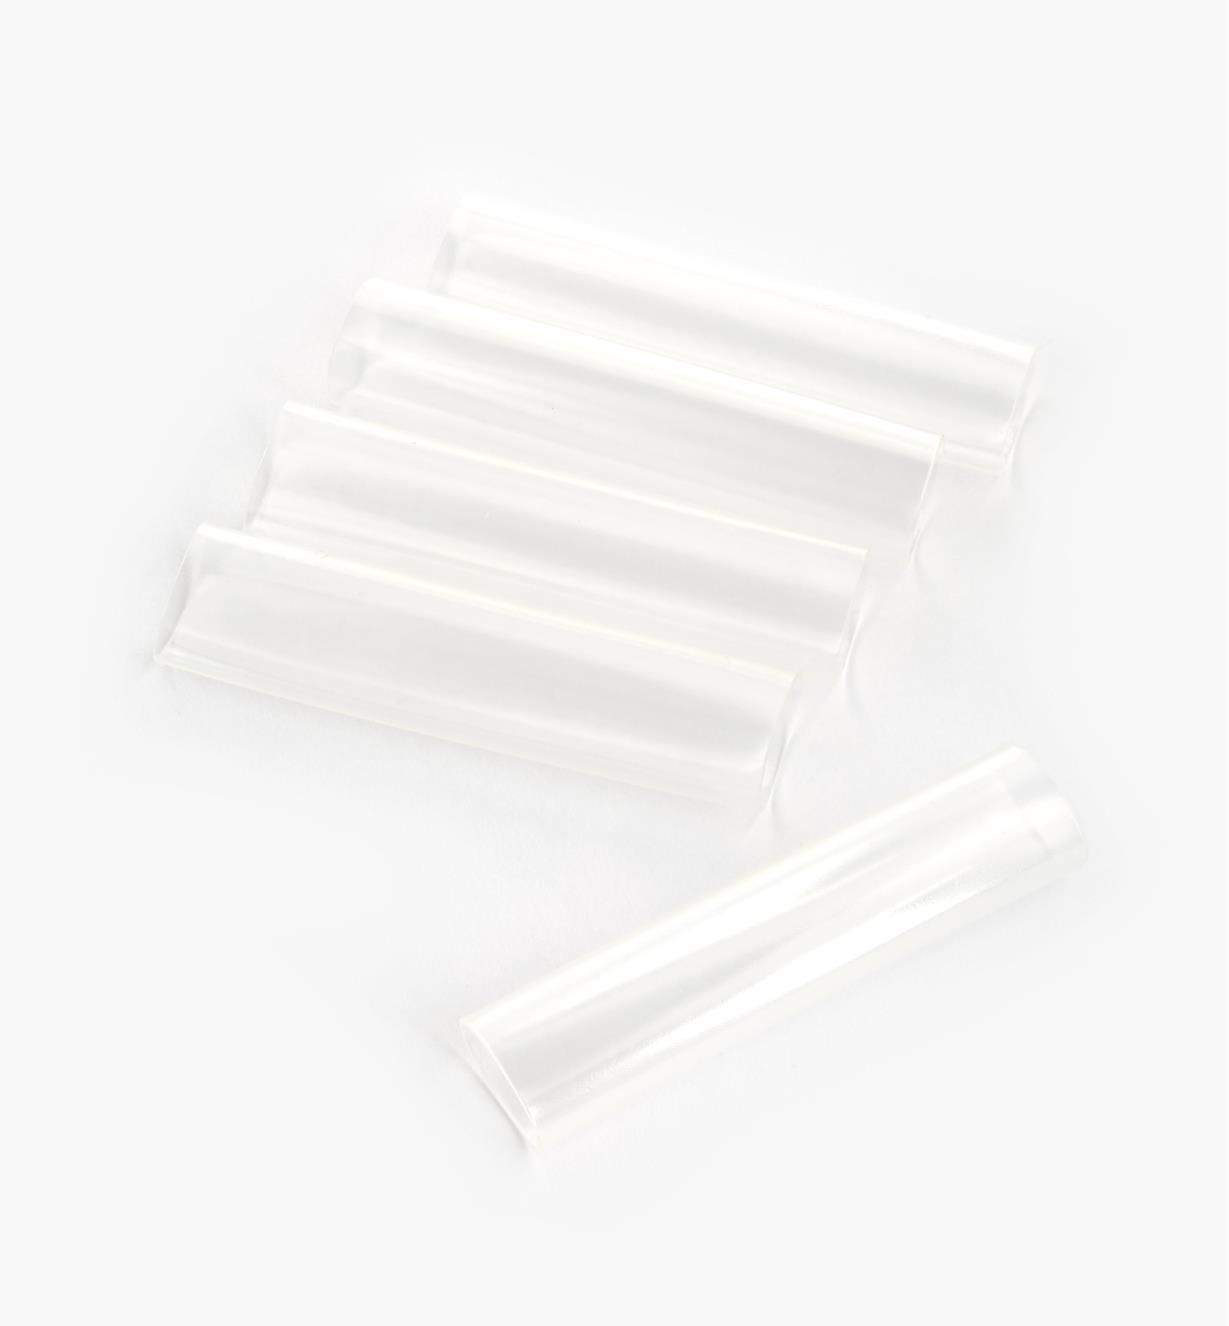 00U4145 - Tubes thermorétrécissables pour luminaire-ruban blanc, lepaquetde5